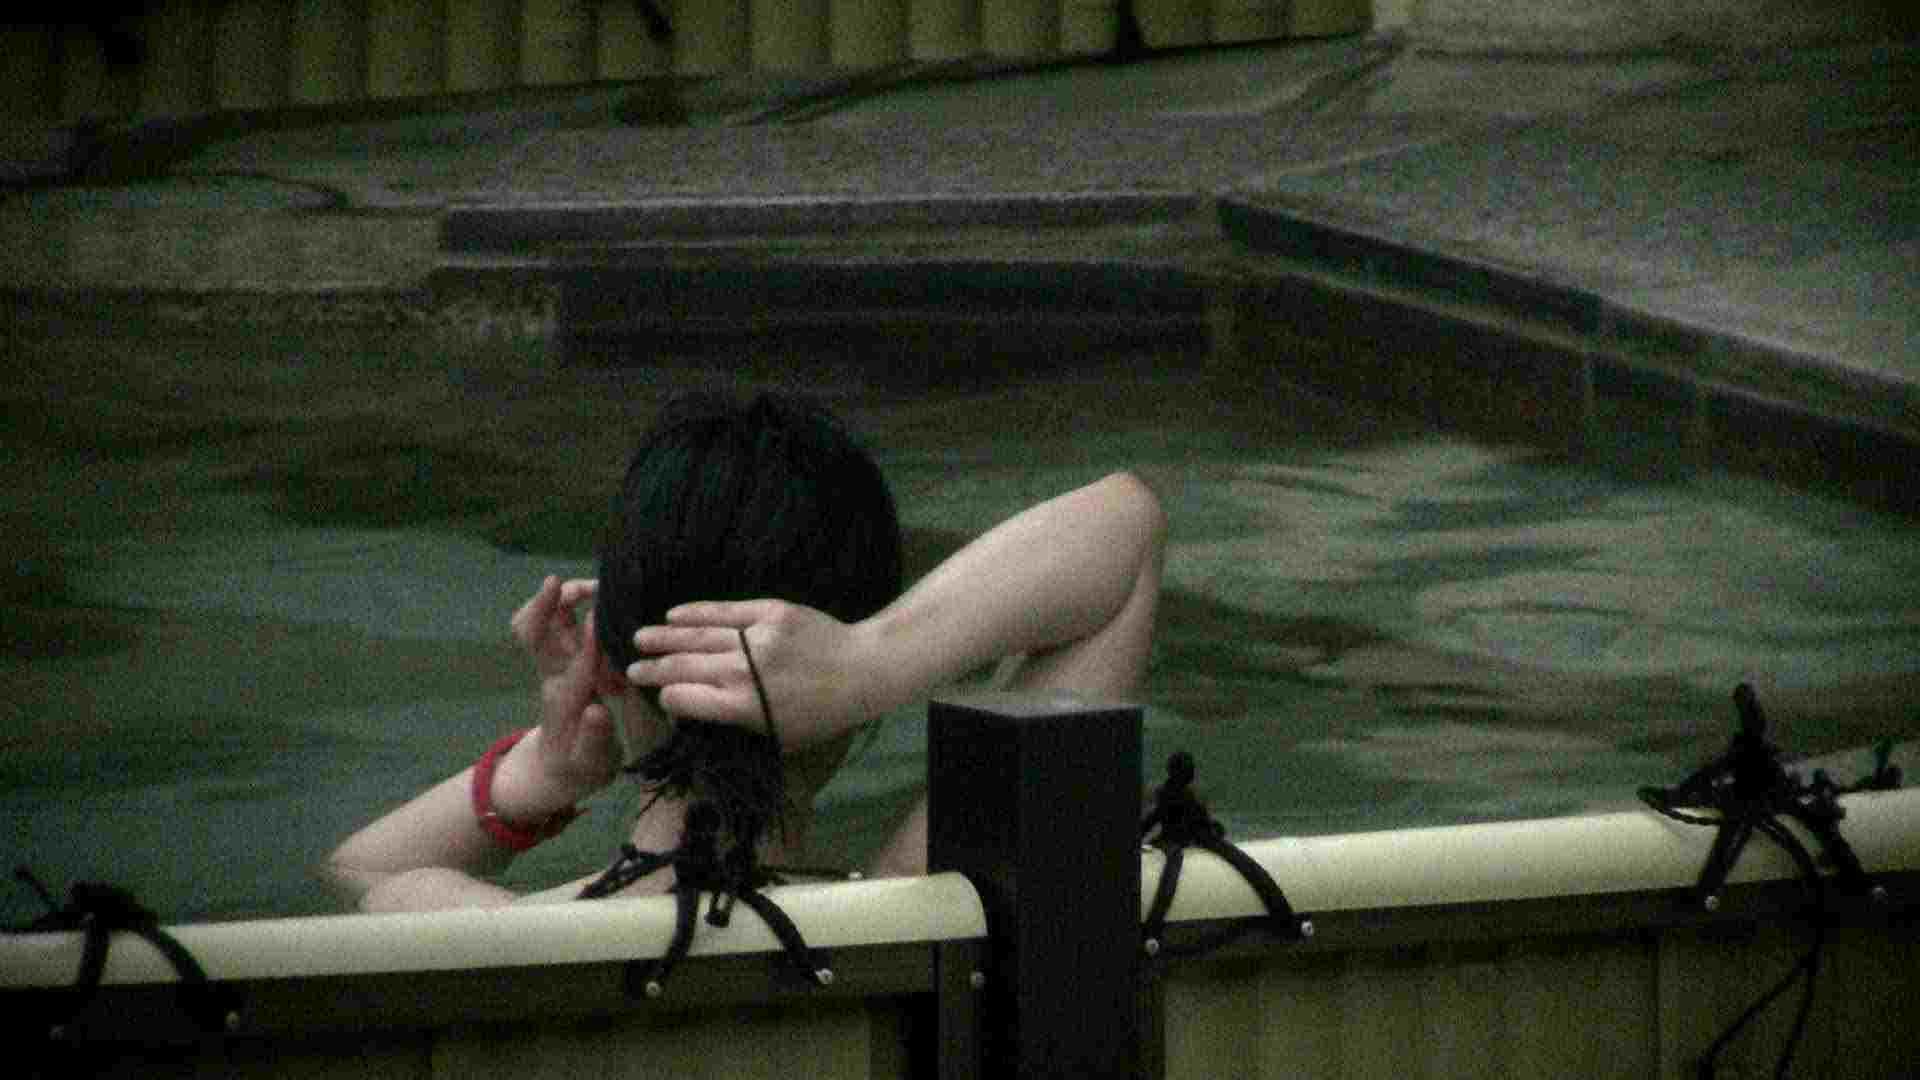 Aquaな露天風呂Vol.684 HなOL オメコ動画キャプチャ 87pic 62